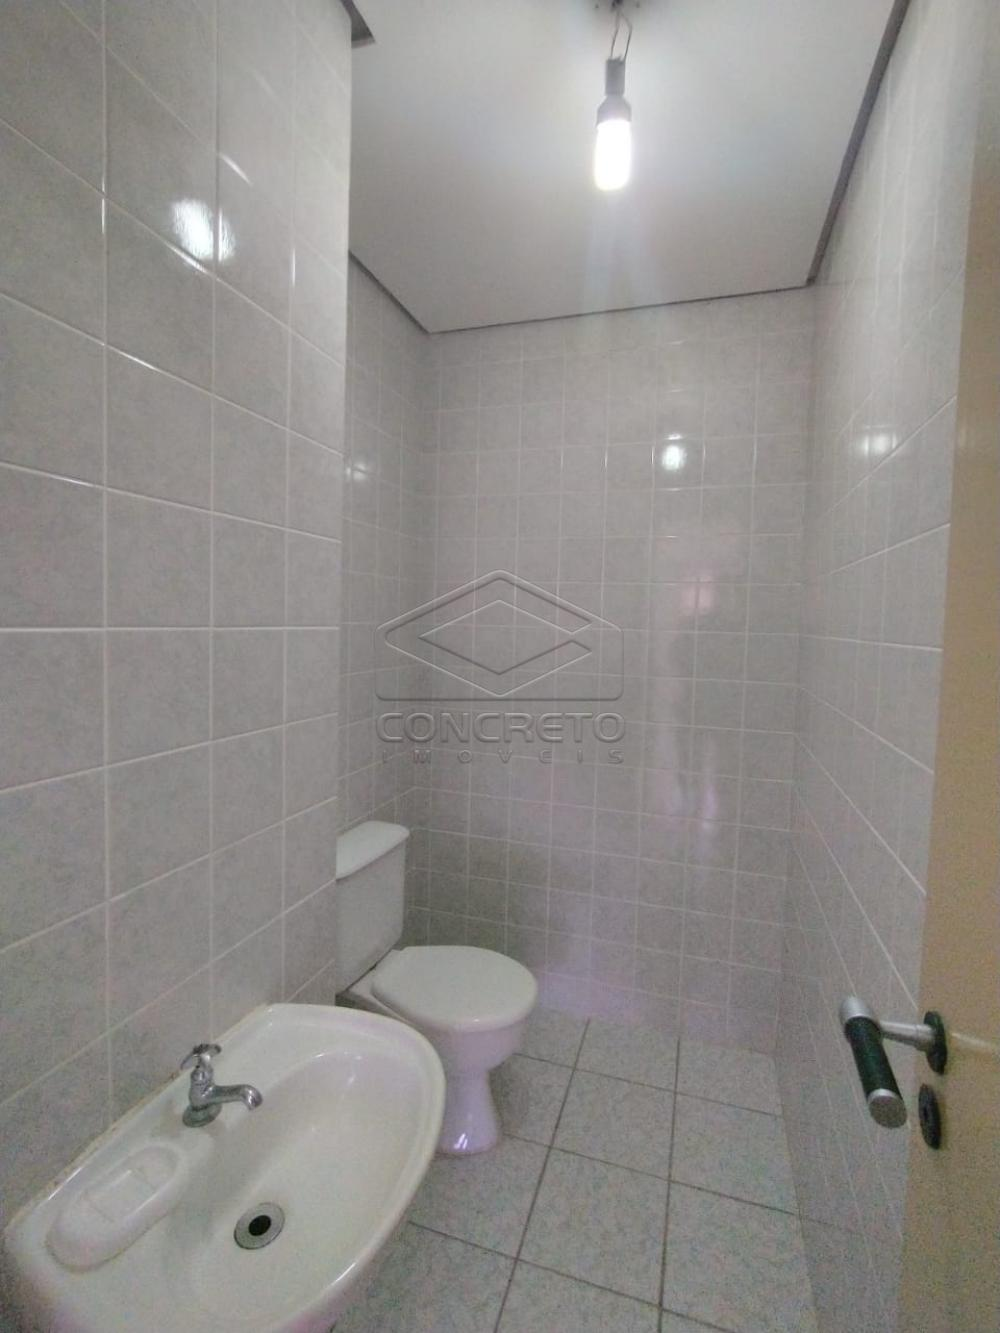 Alugar Comercial / Sala em Bauru R$ 700,00 - Foto 2